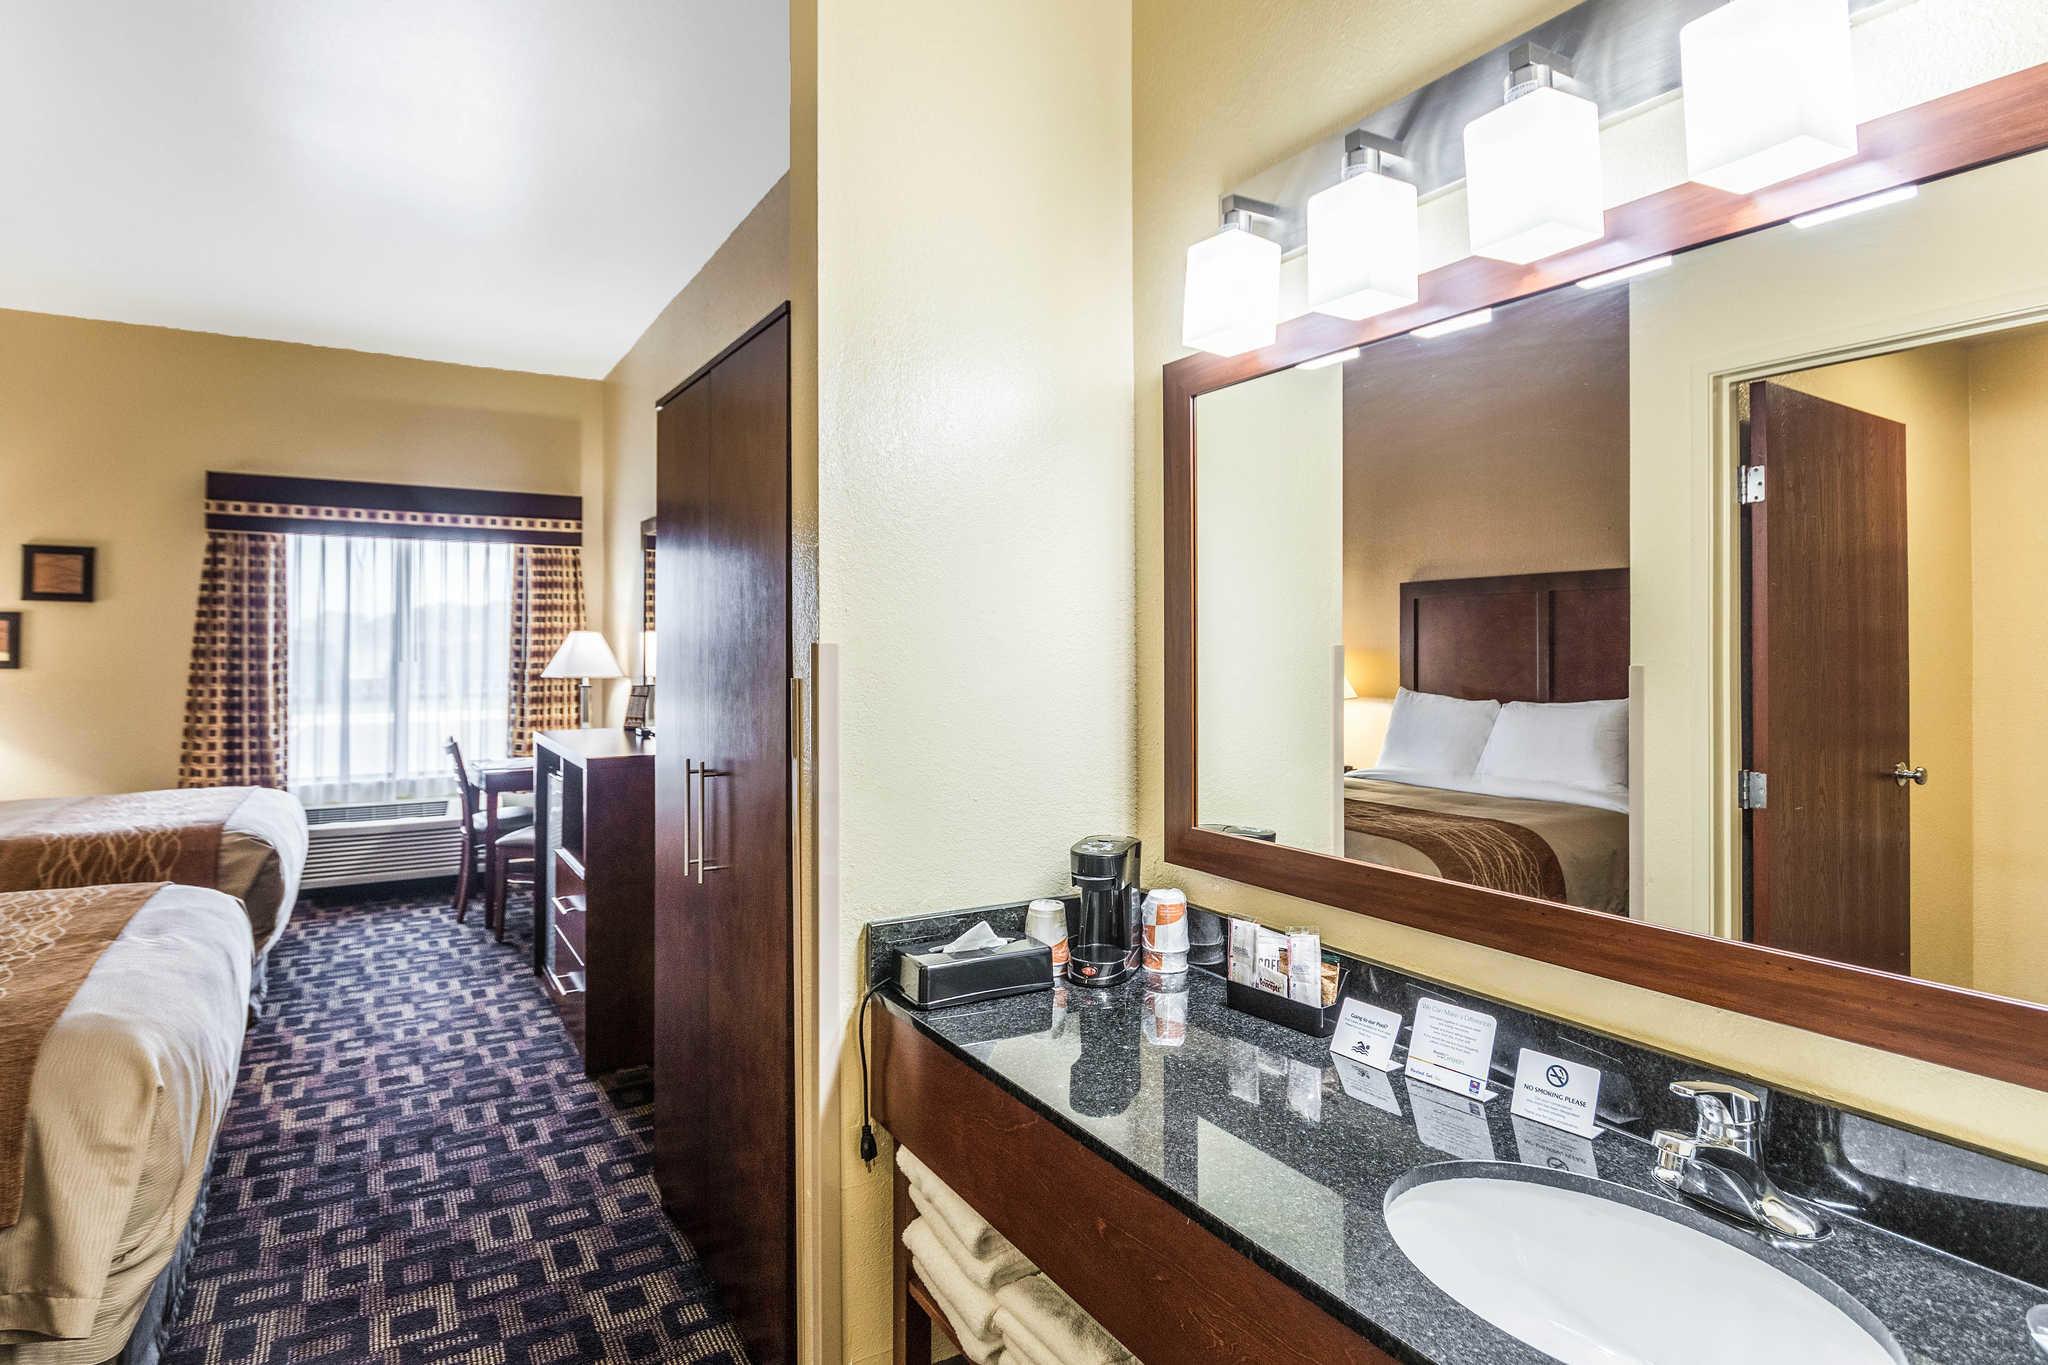 Comfort Inn & Suites North Aurora - Naperville image 16